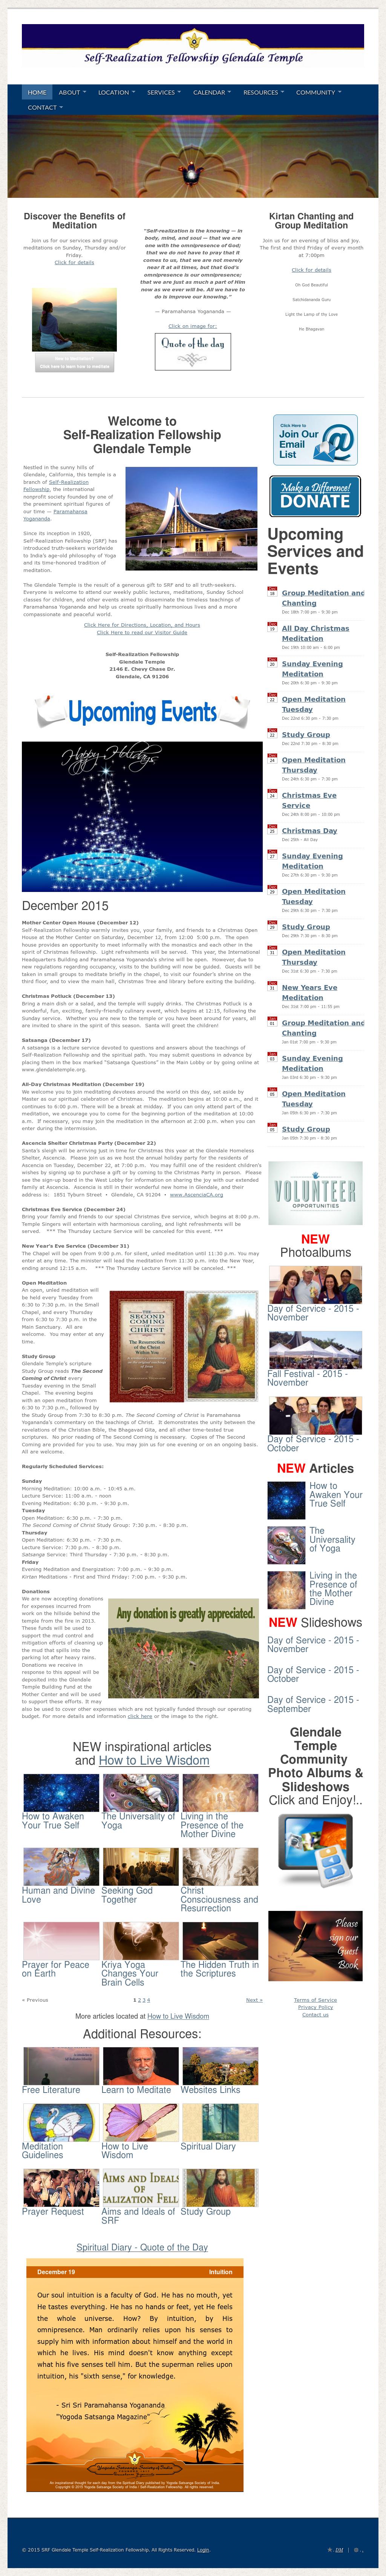 Srf Glendale Temple Self-realization Fellowship Competitors, Revenue ...